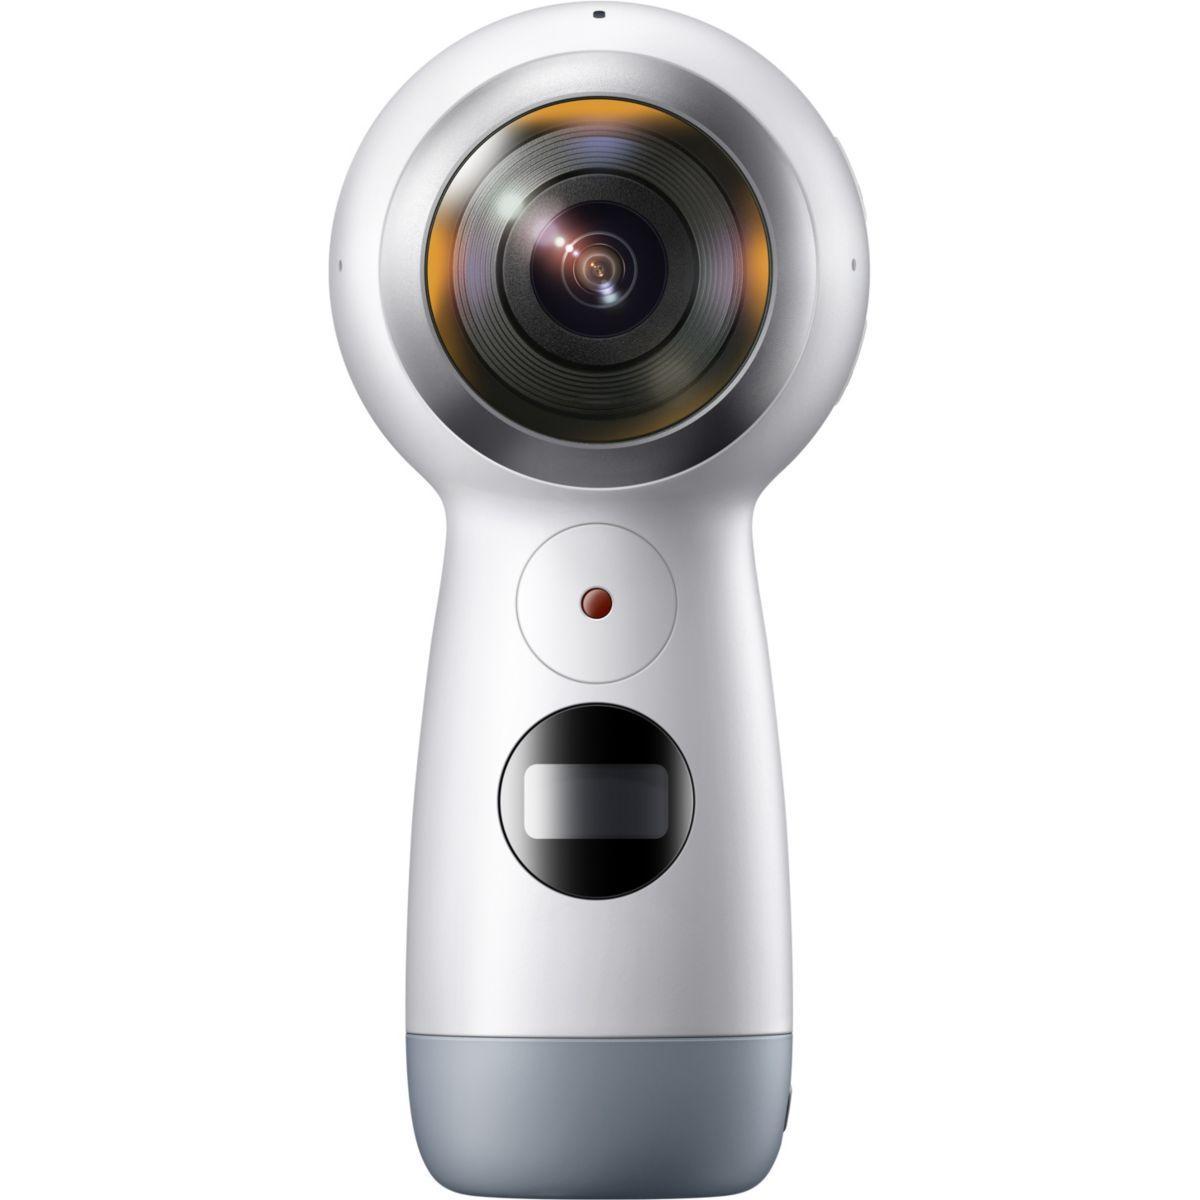 Cam?ra 360? samsung gear 360 (2017)